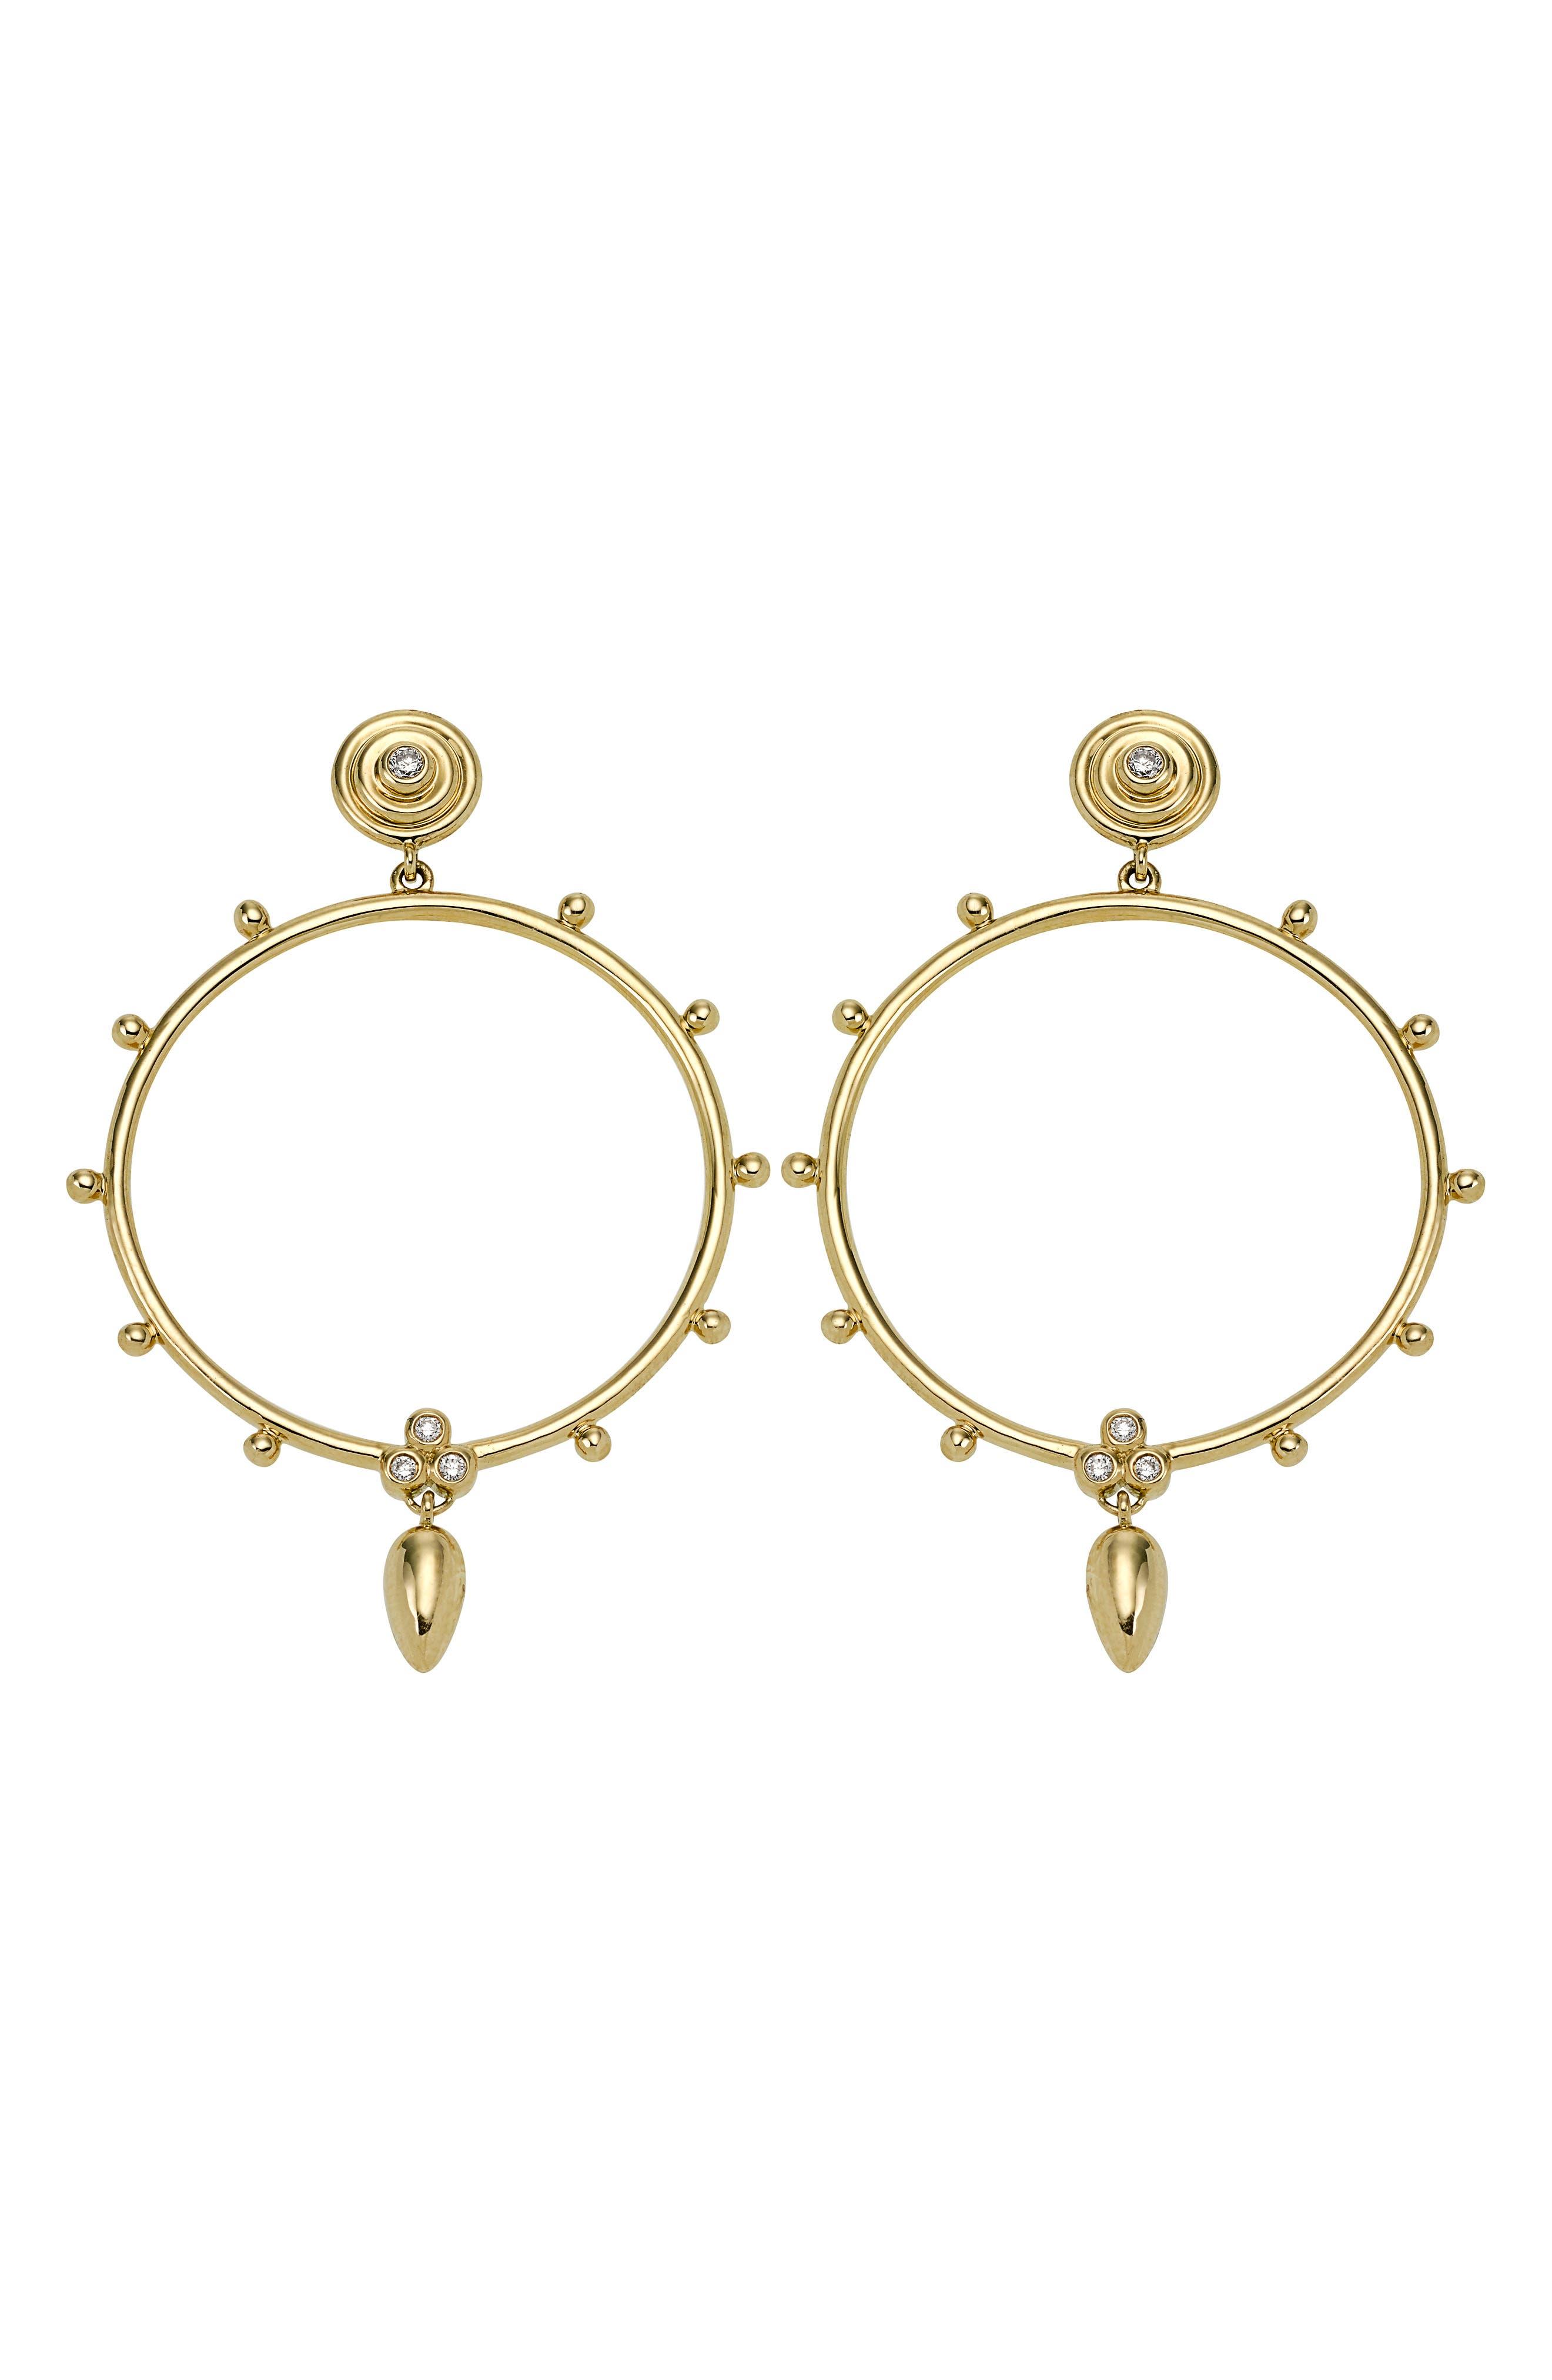 18K Gold & Diamond Circle Anfora Earrings,                             Main thumbnail 1, color,                             Yellow Gold